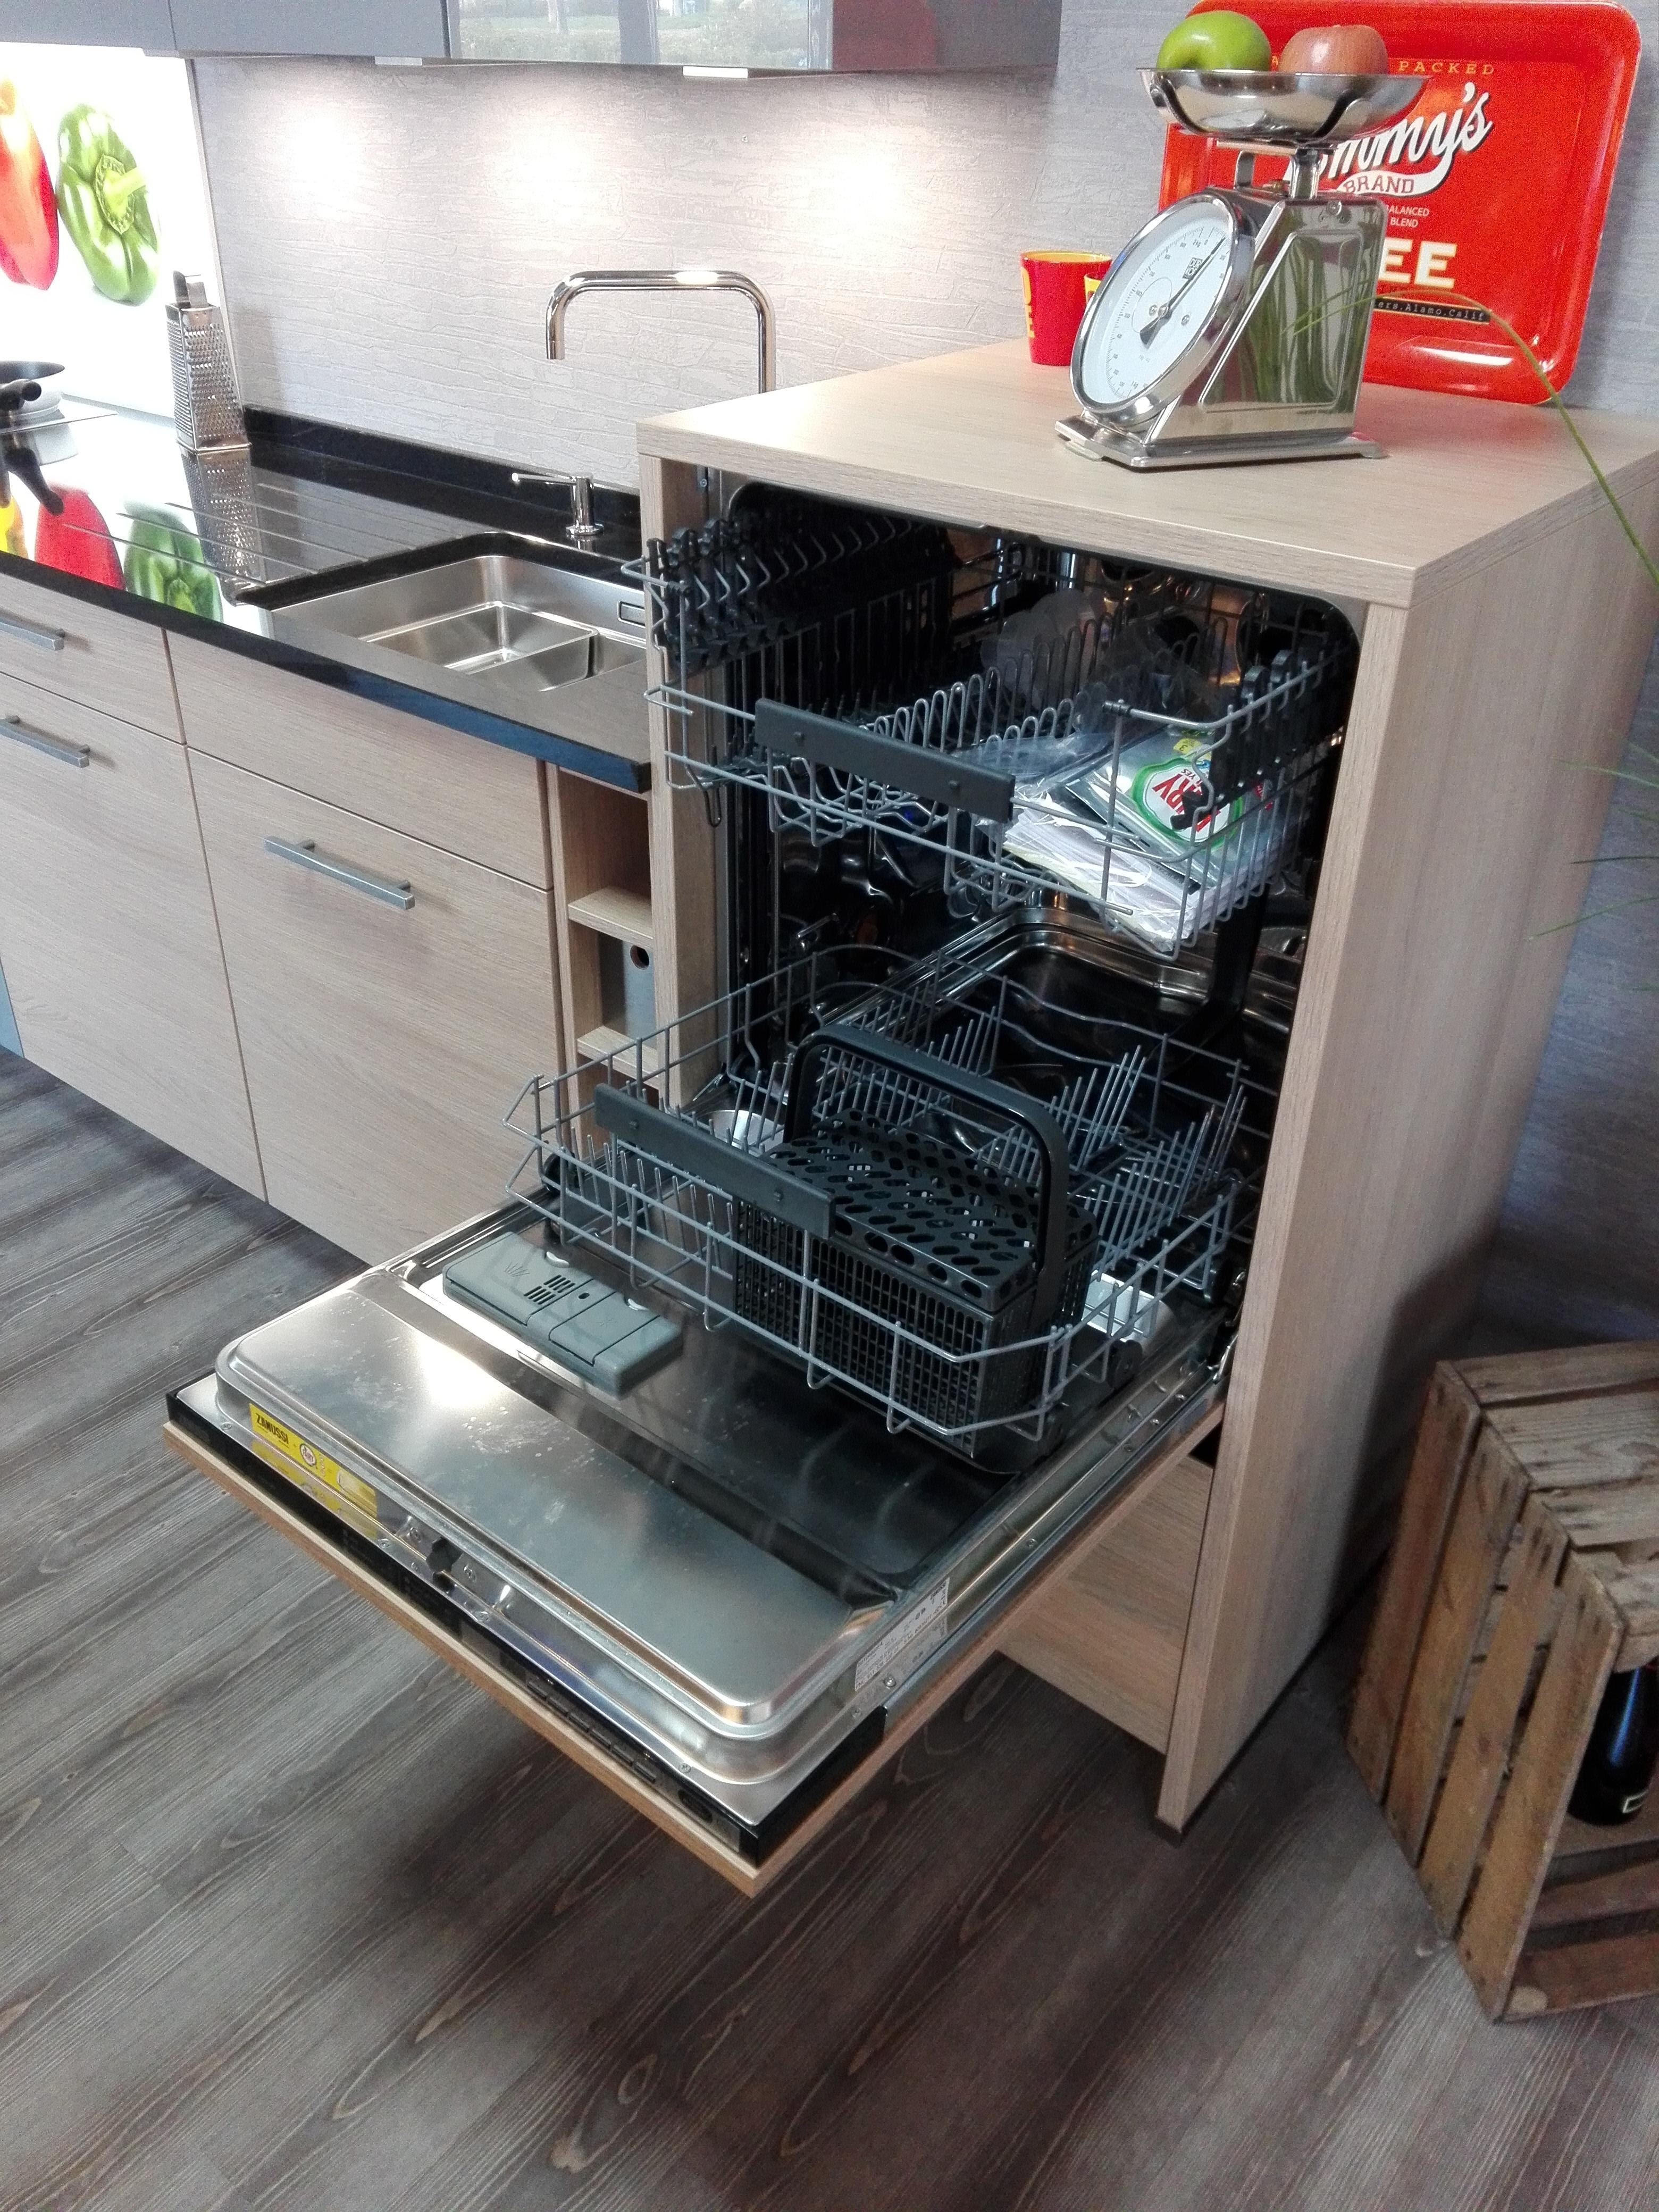 Küche 3 - ergonomisch hochgebauter Geschirrspüler